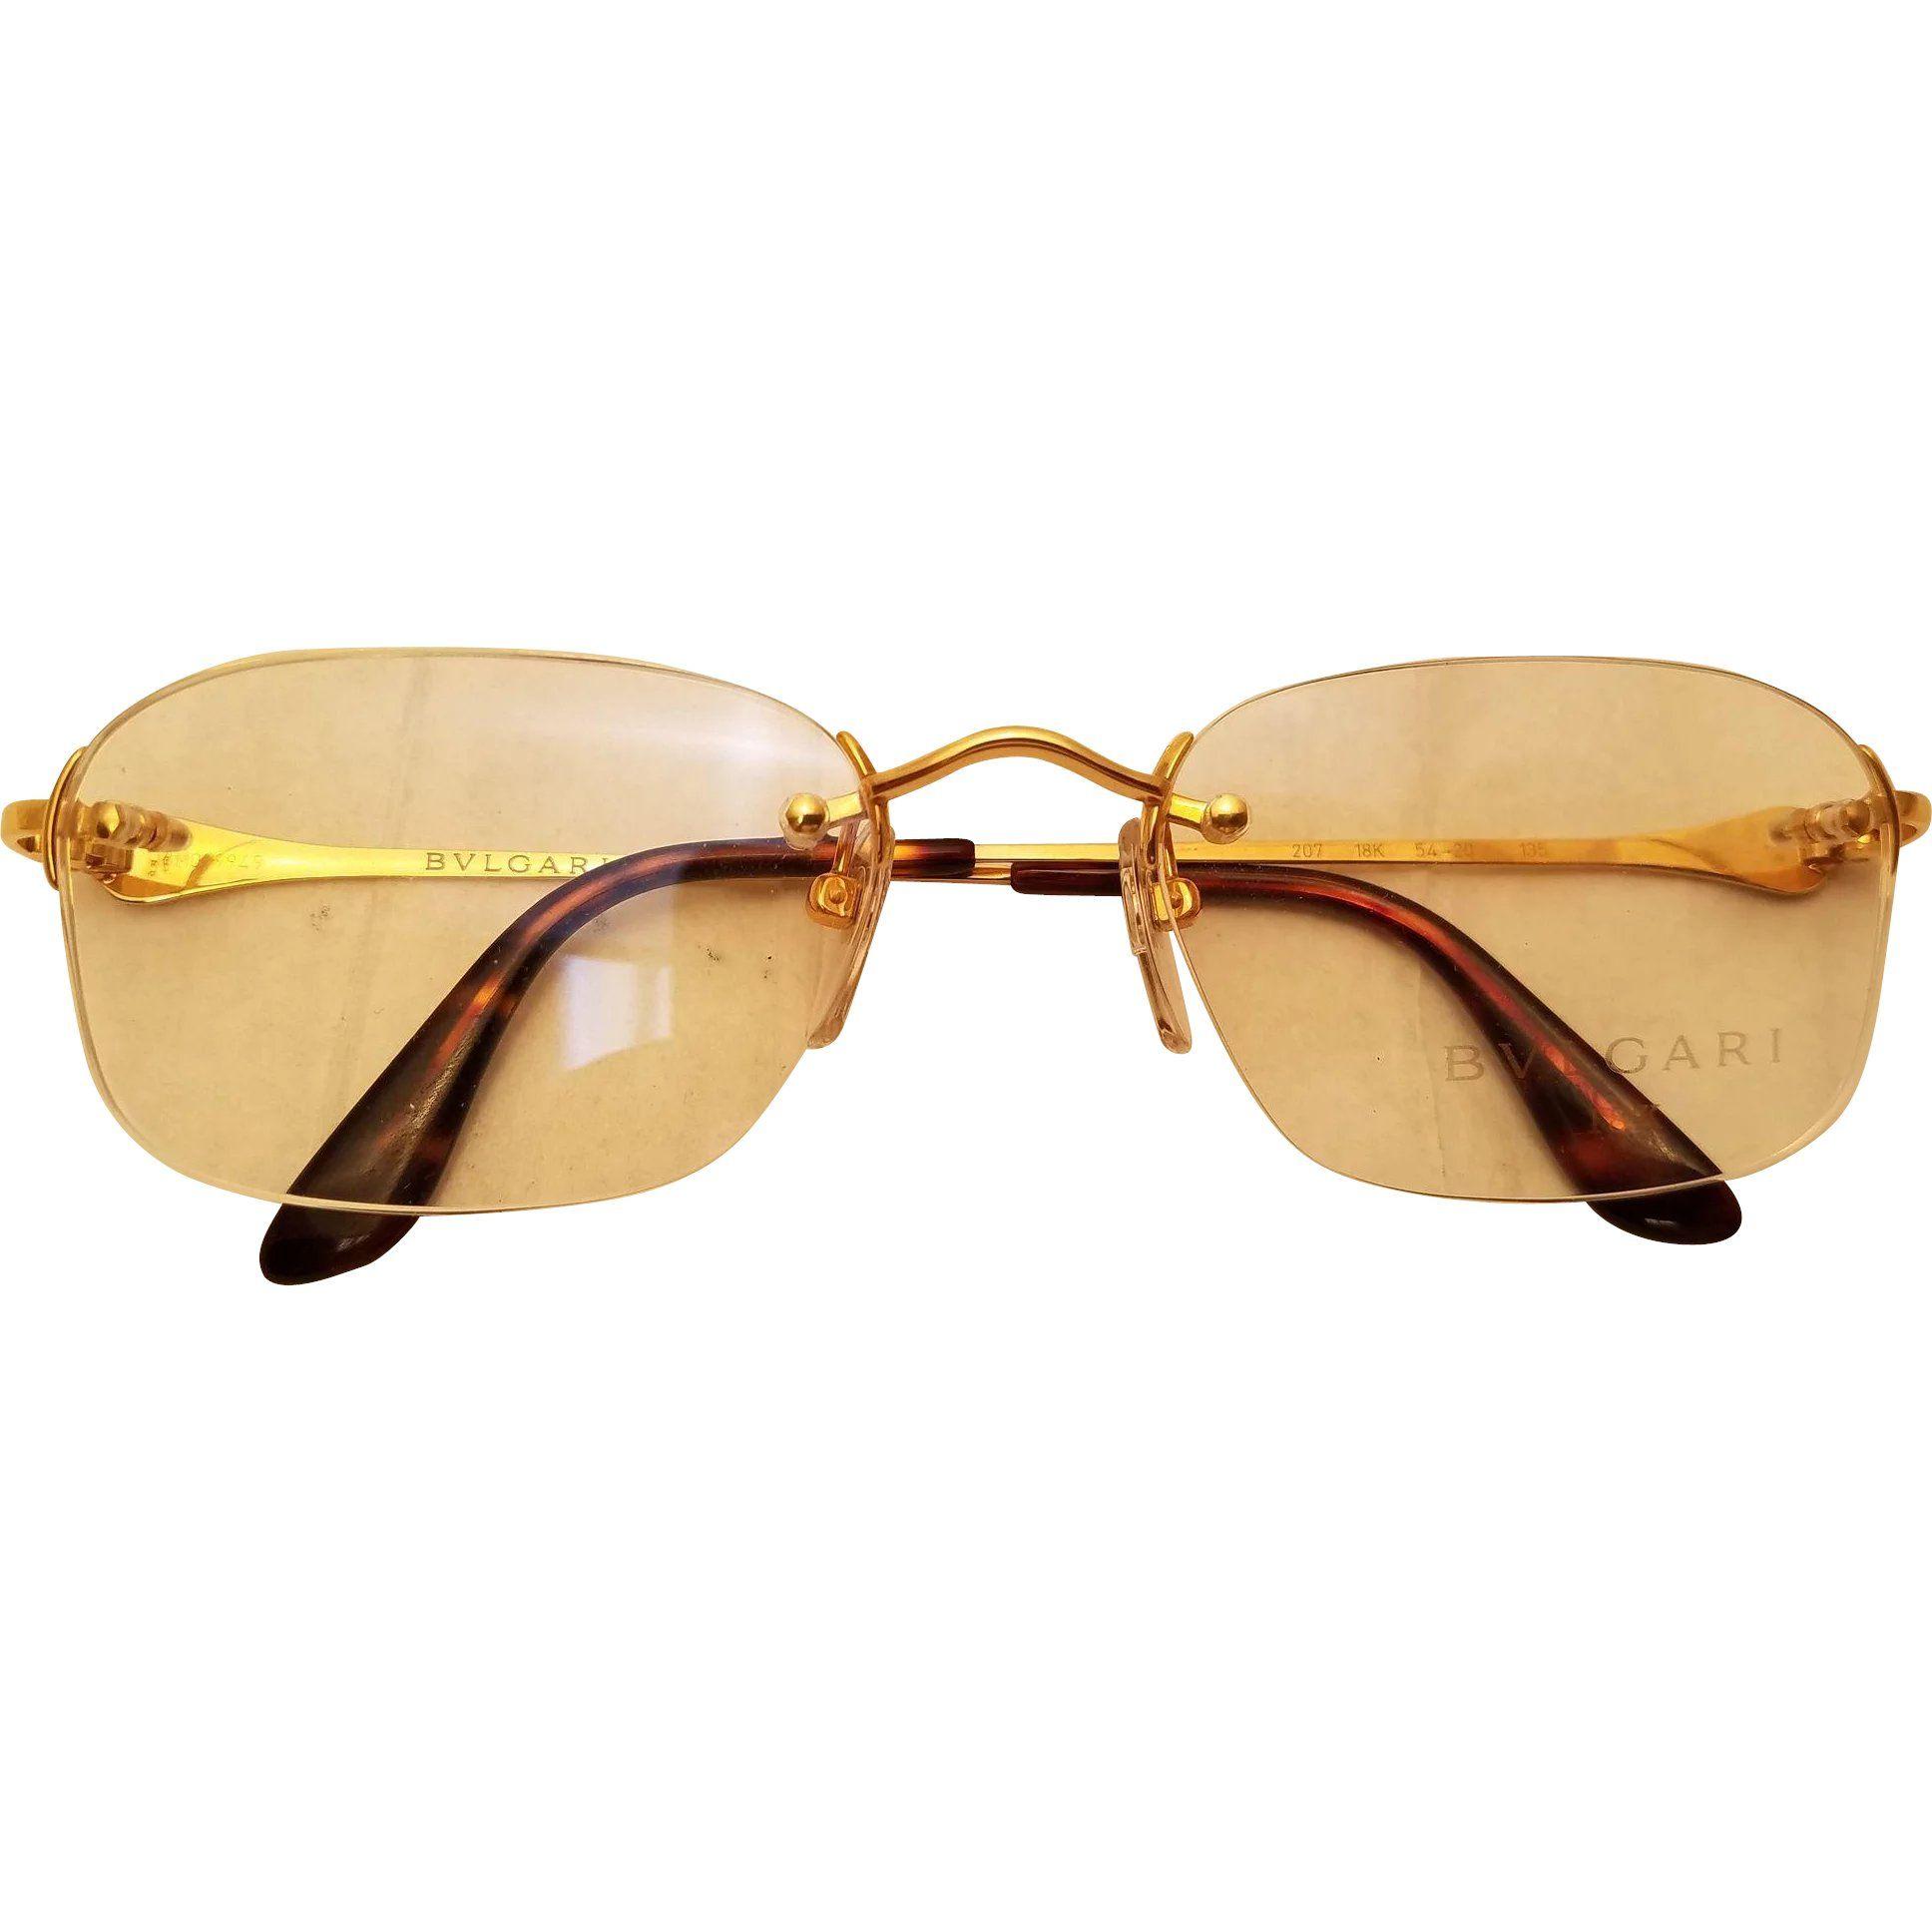 c3c96469e20 Bulgari  Bvlgari Gold 18k Rimless Sunglasses www.rubylane.com   vintagebeginshere  eyewear  glasses  sunglasses